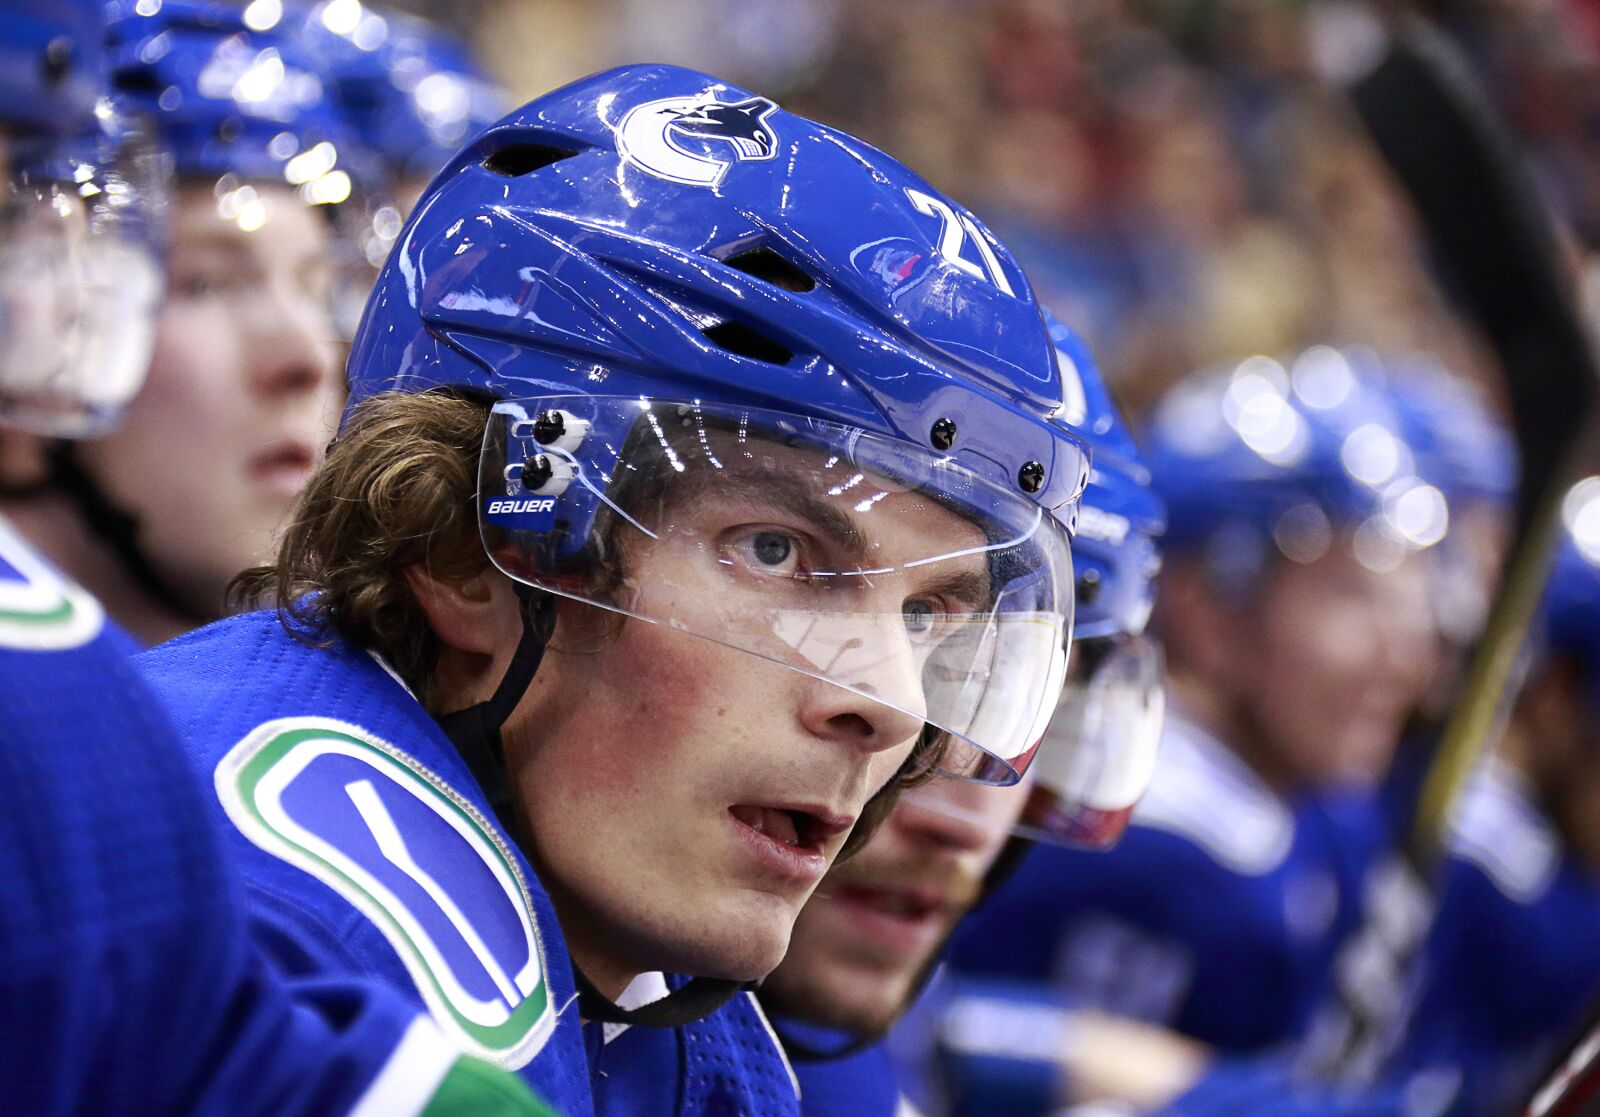 Vancouver Canucks: 3 realistic trade ideas for Loui Eriksson